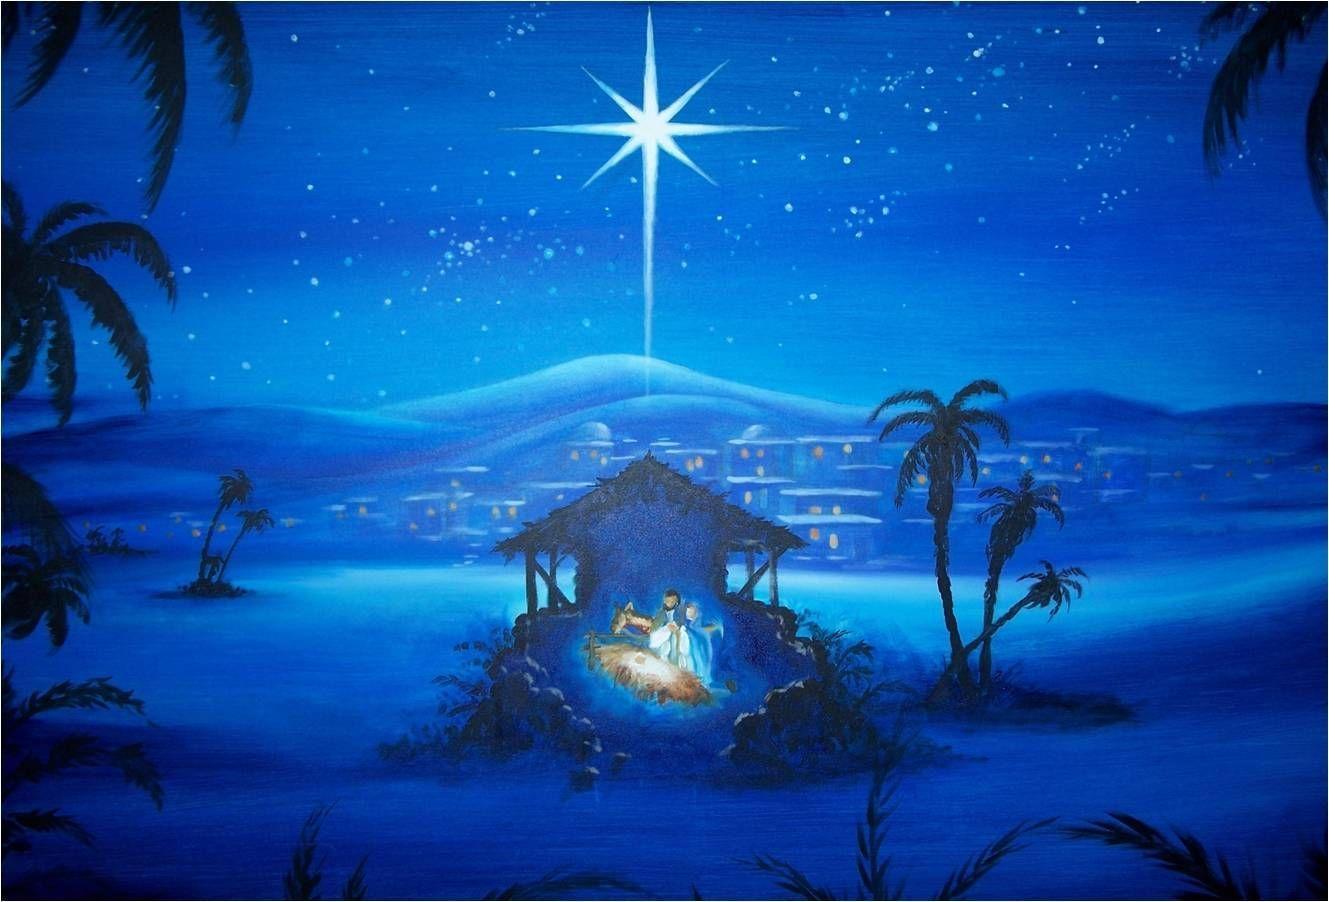 Vintage Christmas Nativity Wallpapers Top Free Vintage Christmas